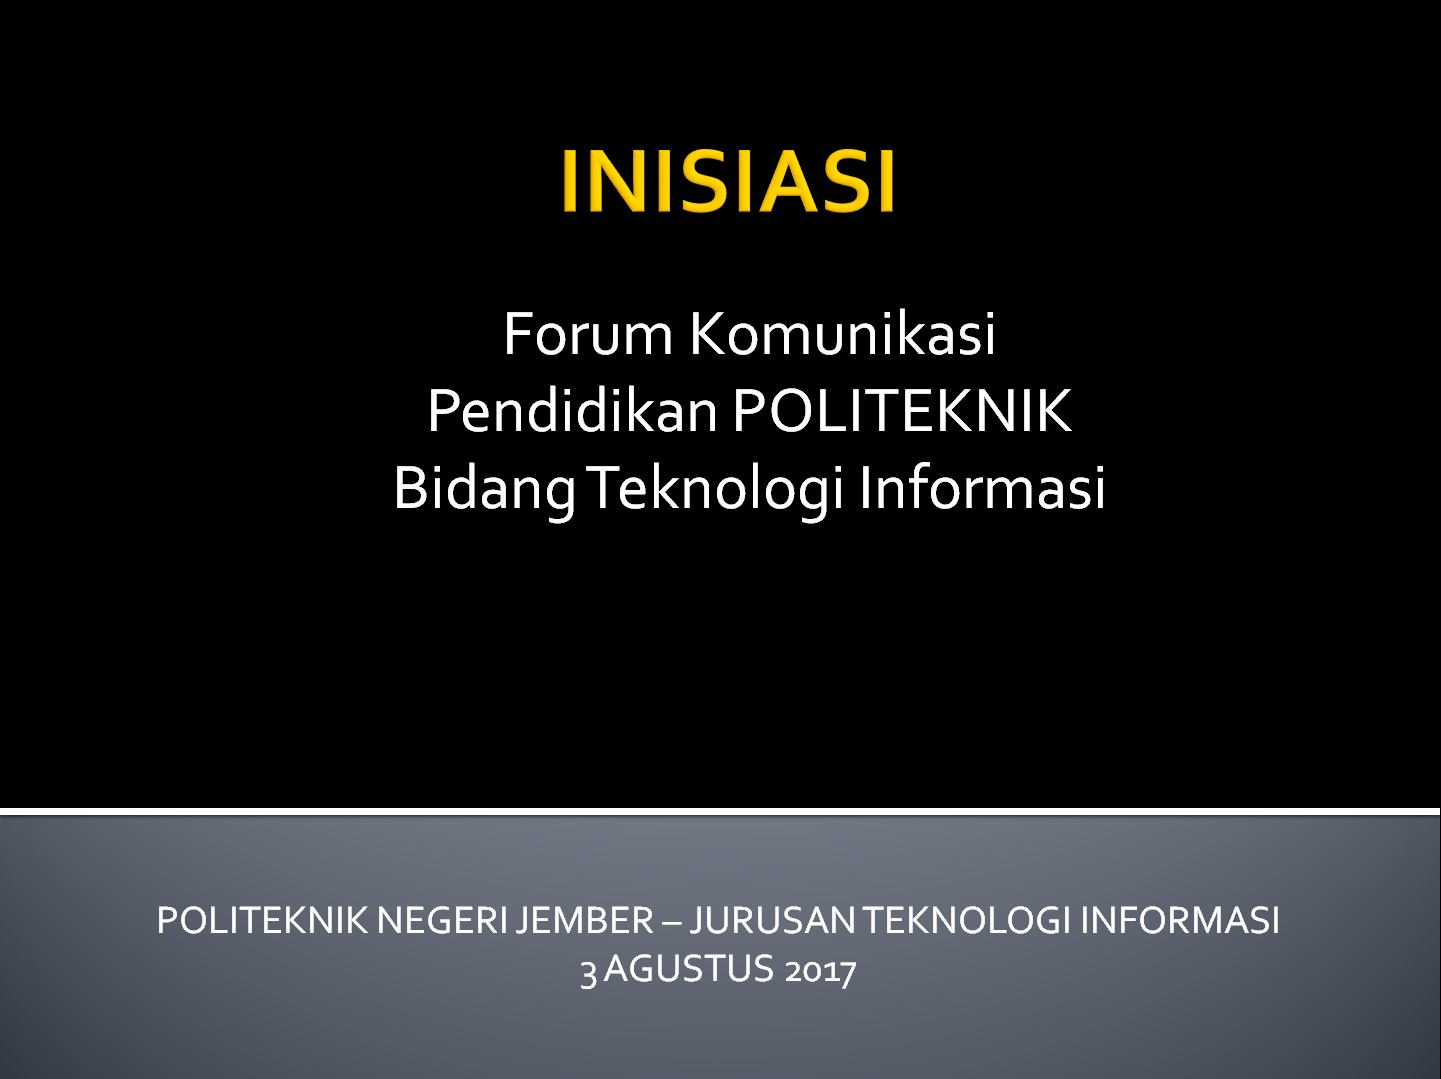 Inisiasi Forum Komunikasi Politeknik Bidang Teknologi Informasi